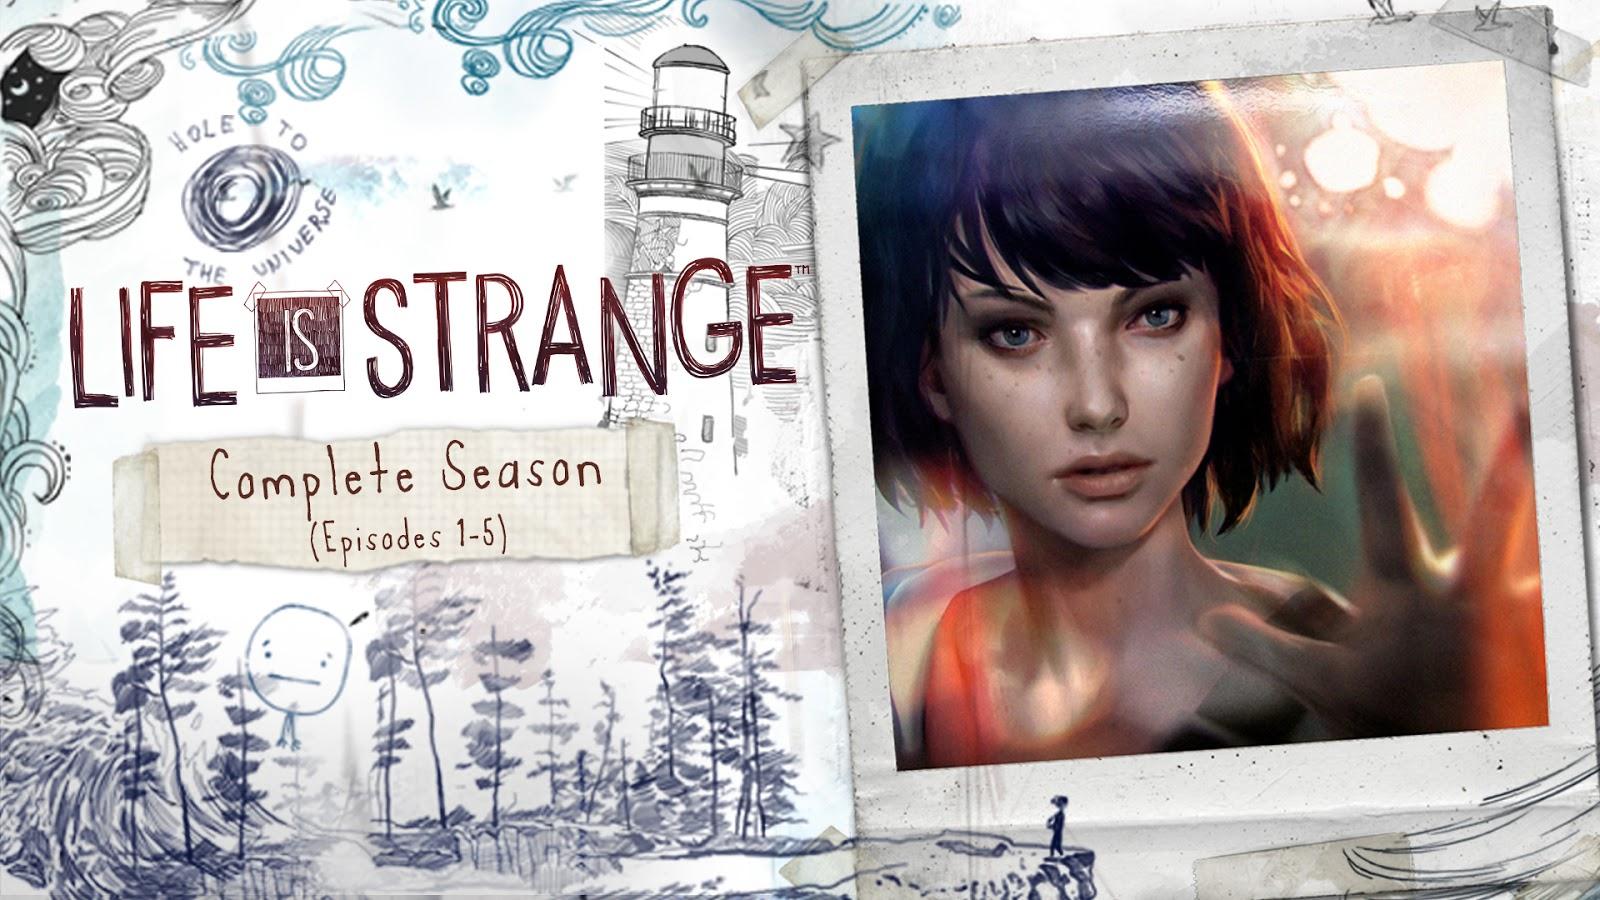 Life is strange free download pc